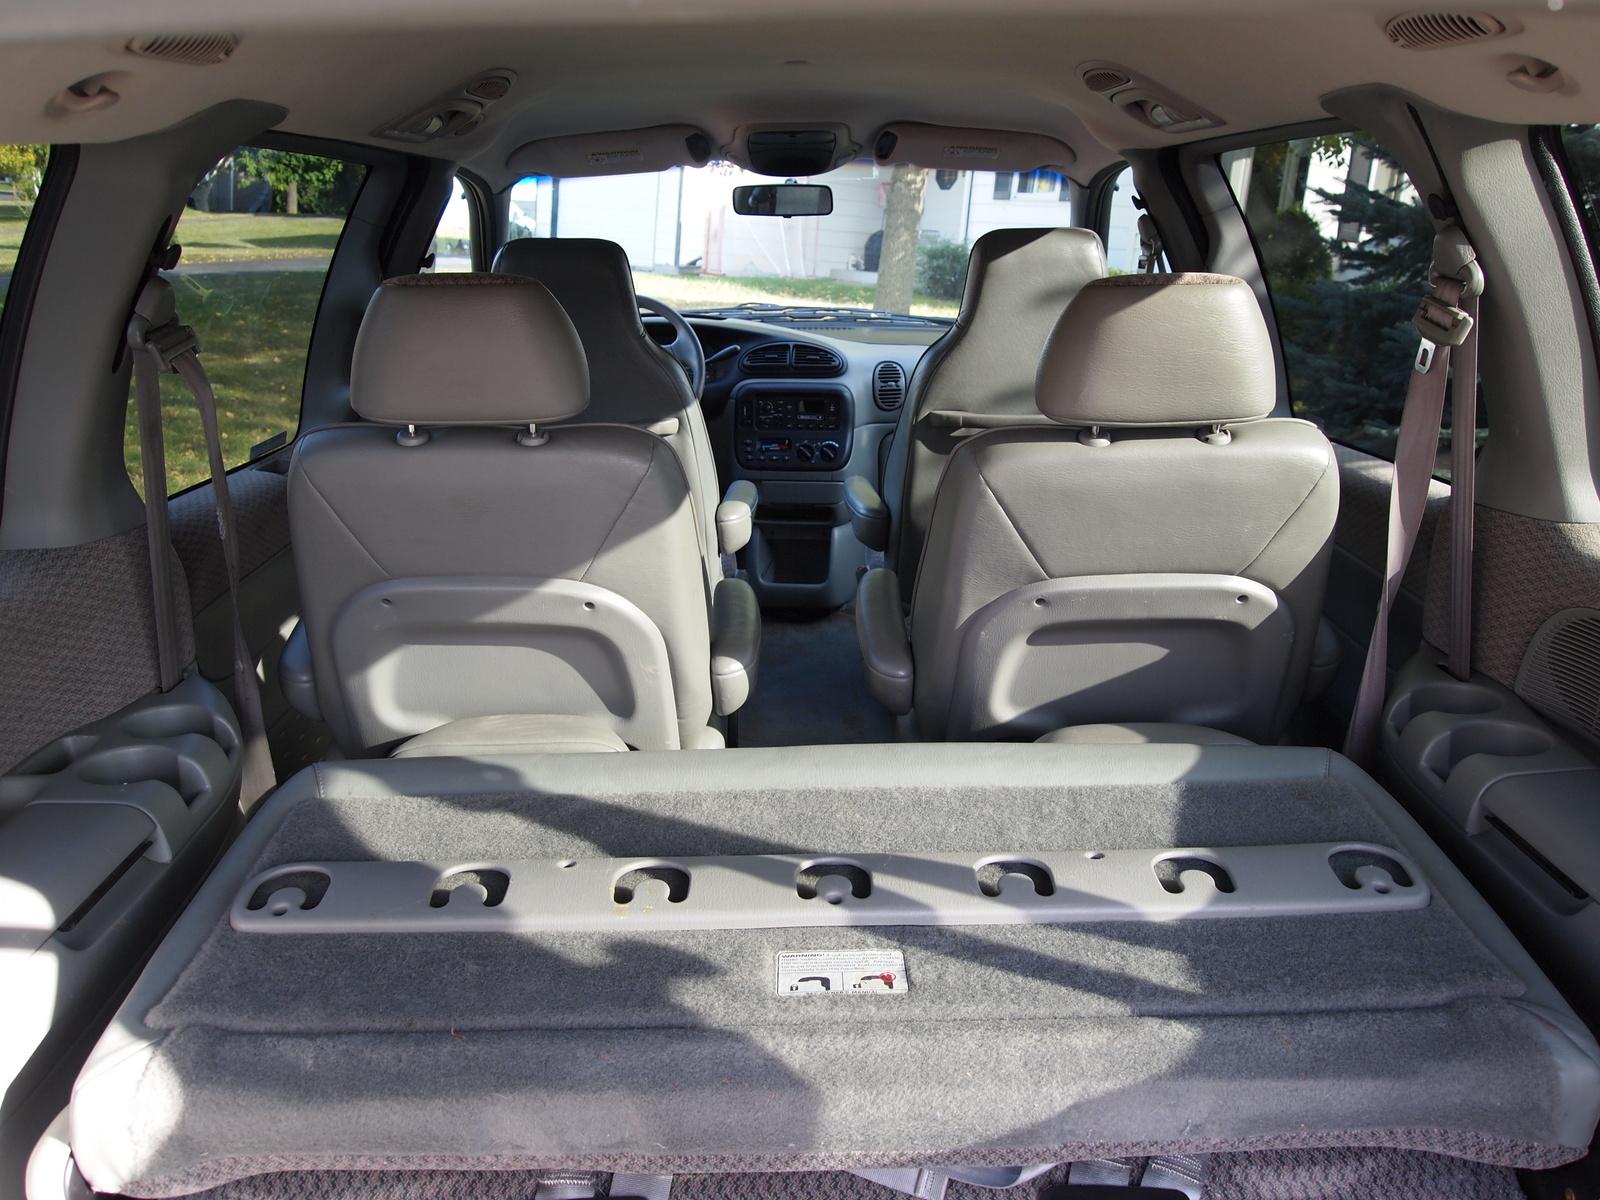 Plymouth Voyager III 1995 - 2000 Minivan #3